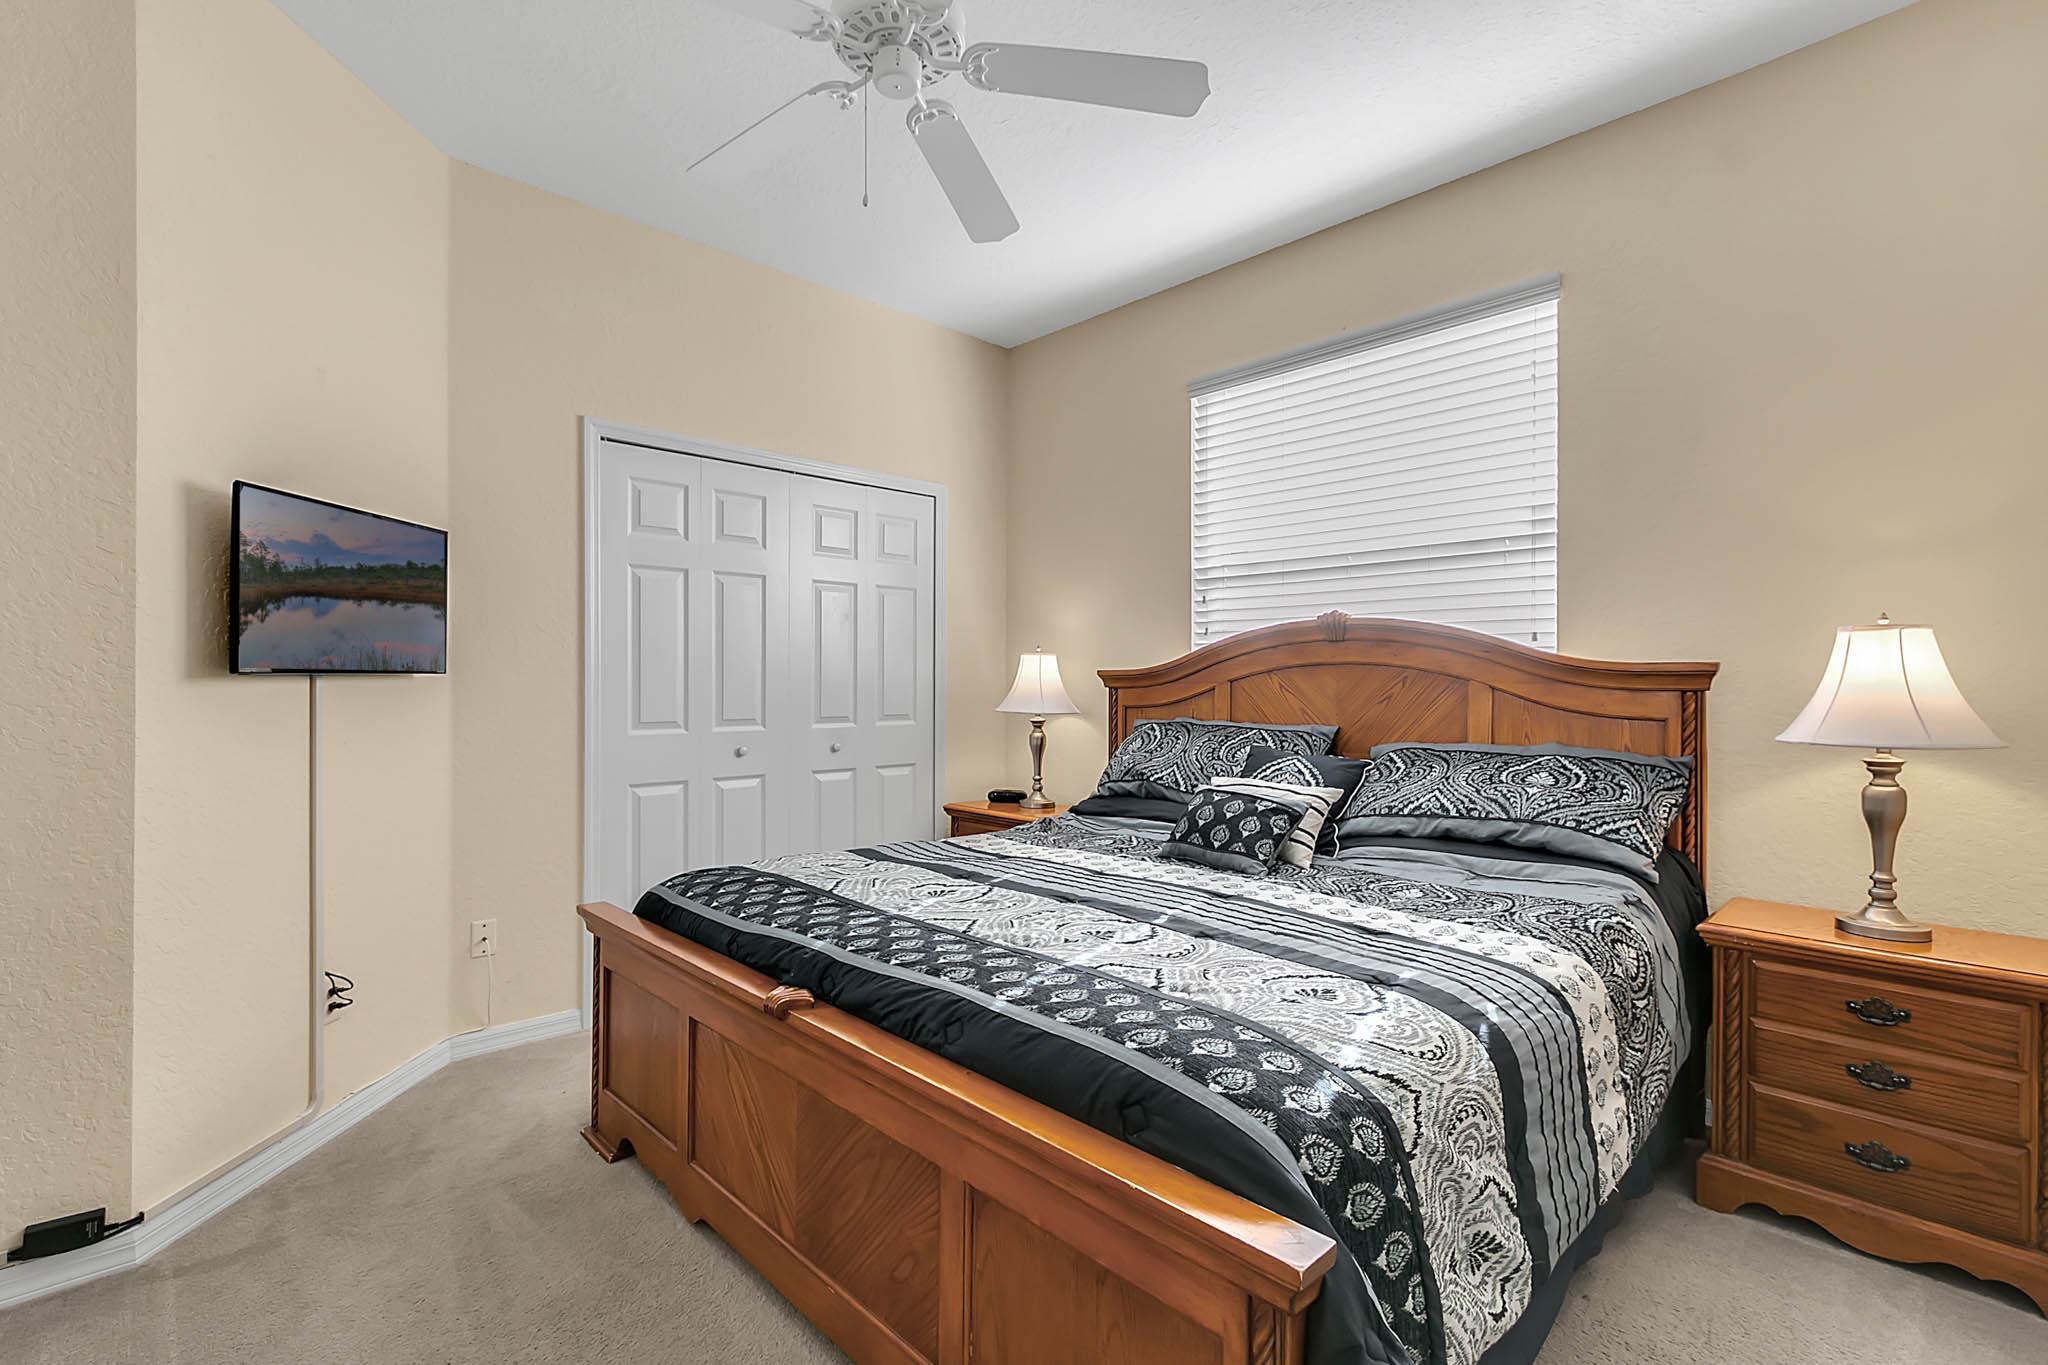 229-N-Hampton-Dr--Davenport--FL-33897----26---Bedroom.jpg